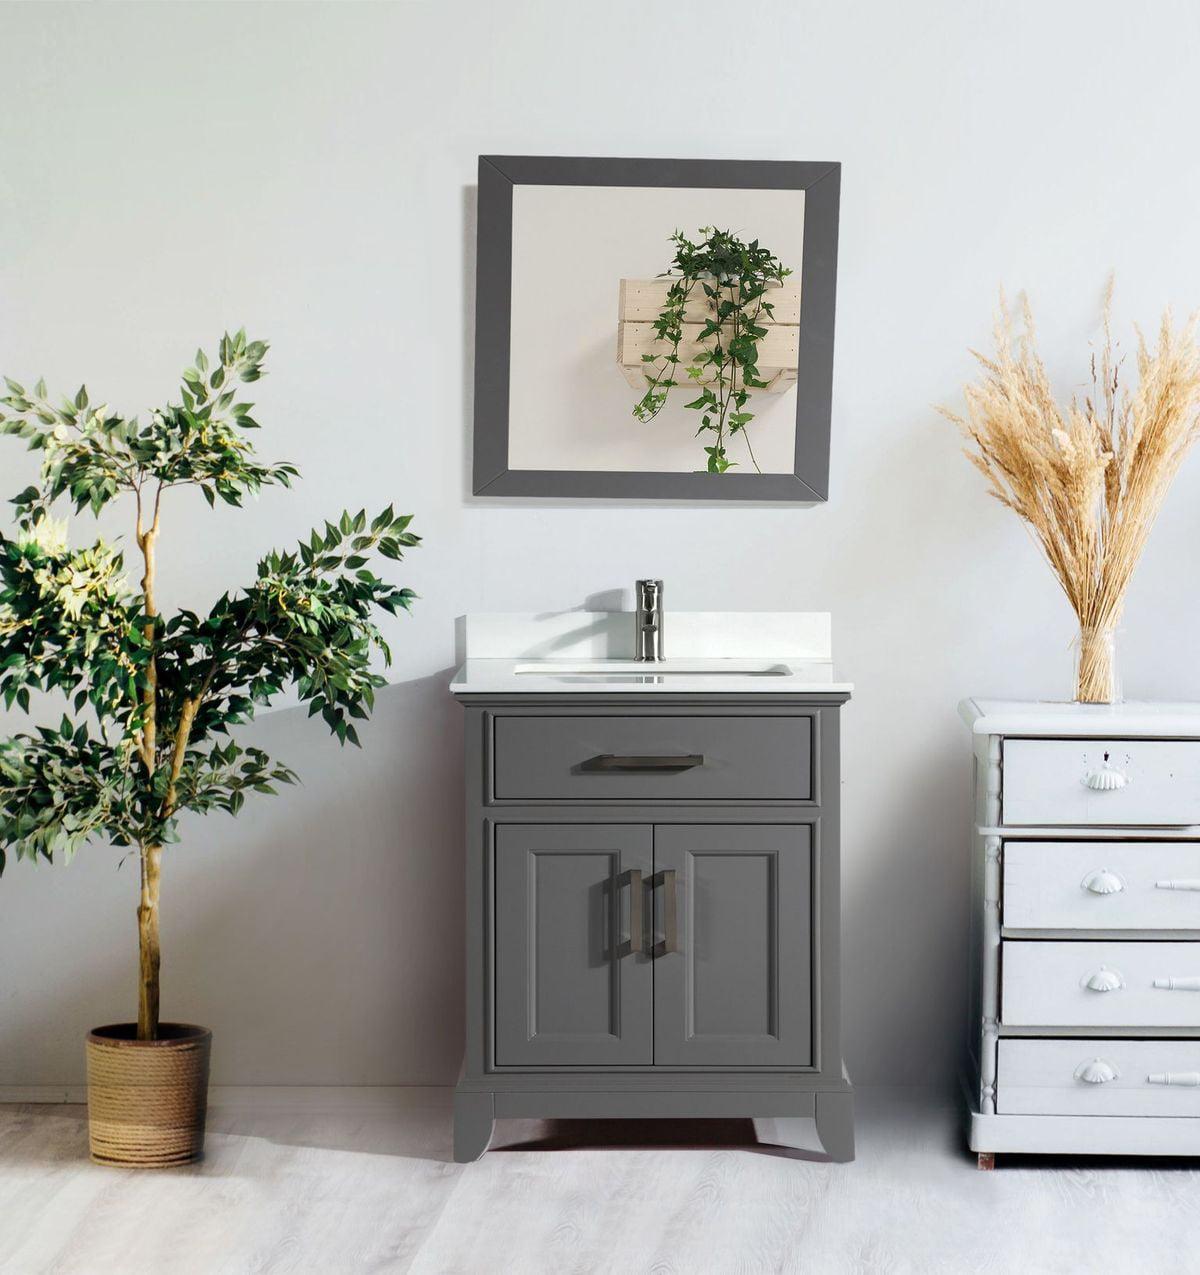 Vanity Art 30 Single Sink Bathroom Vanity Set Modern Carrara Marble Stone Top Under Sink Bathroom Floor Cabinet With Mirror Walmart Com Walmart Com